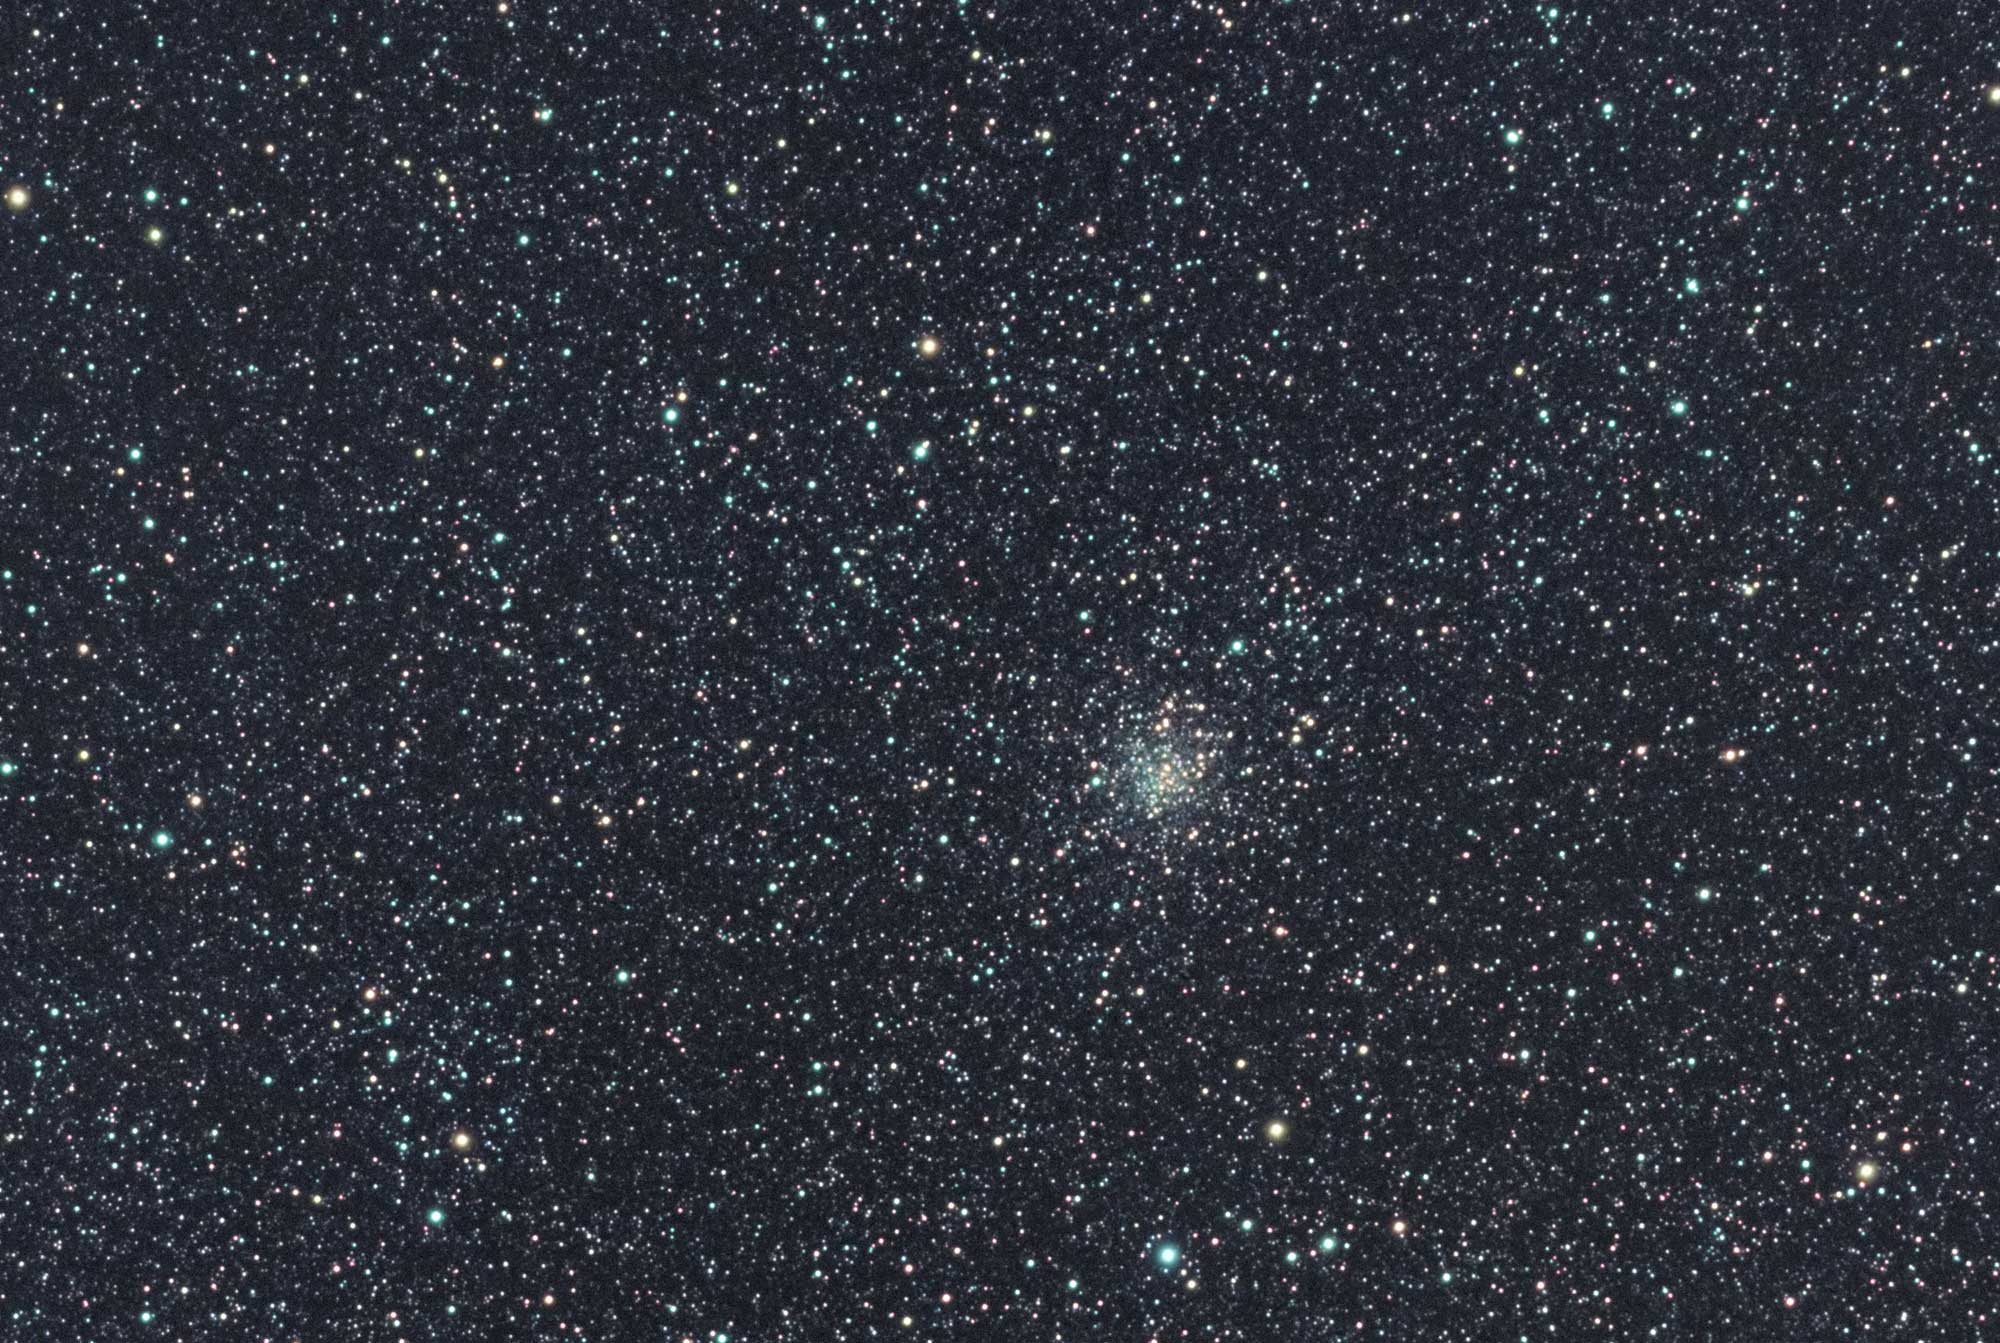 Carina Nebula William Optics GT71 and ASI183MM Pro camera